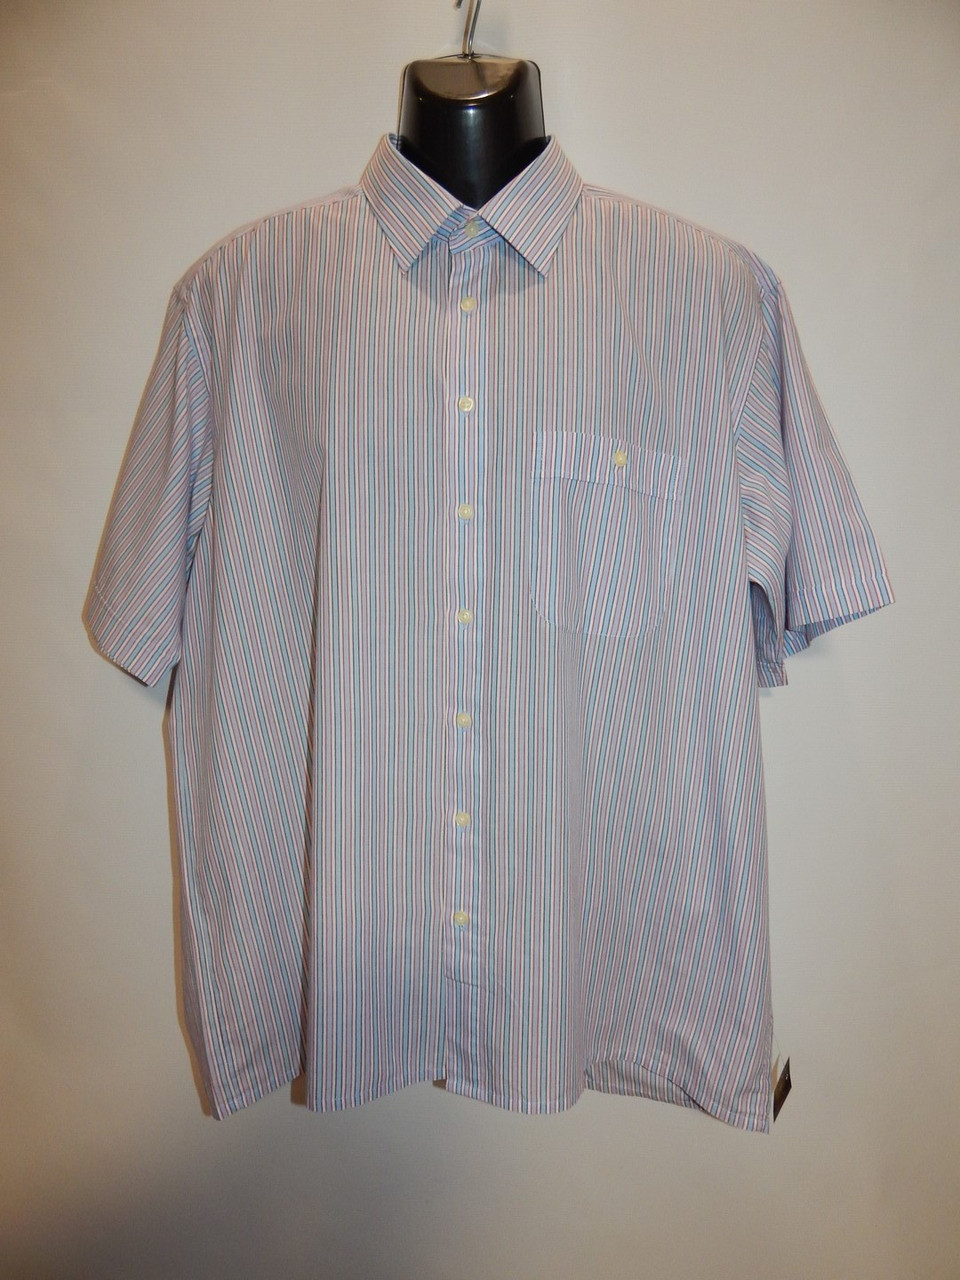 "Мужская рубашка с коротким рукавом Patrick o""Connor оригинал (009КР) р.54"